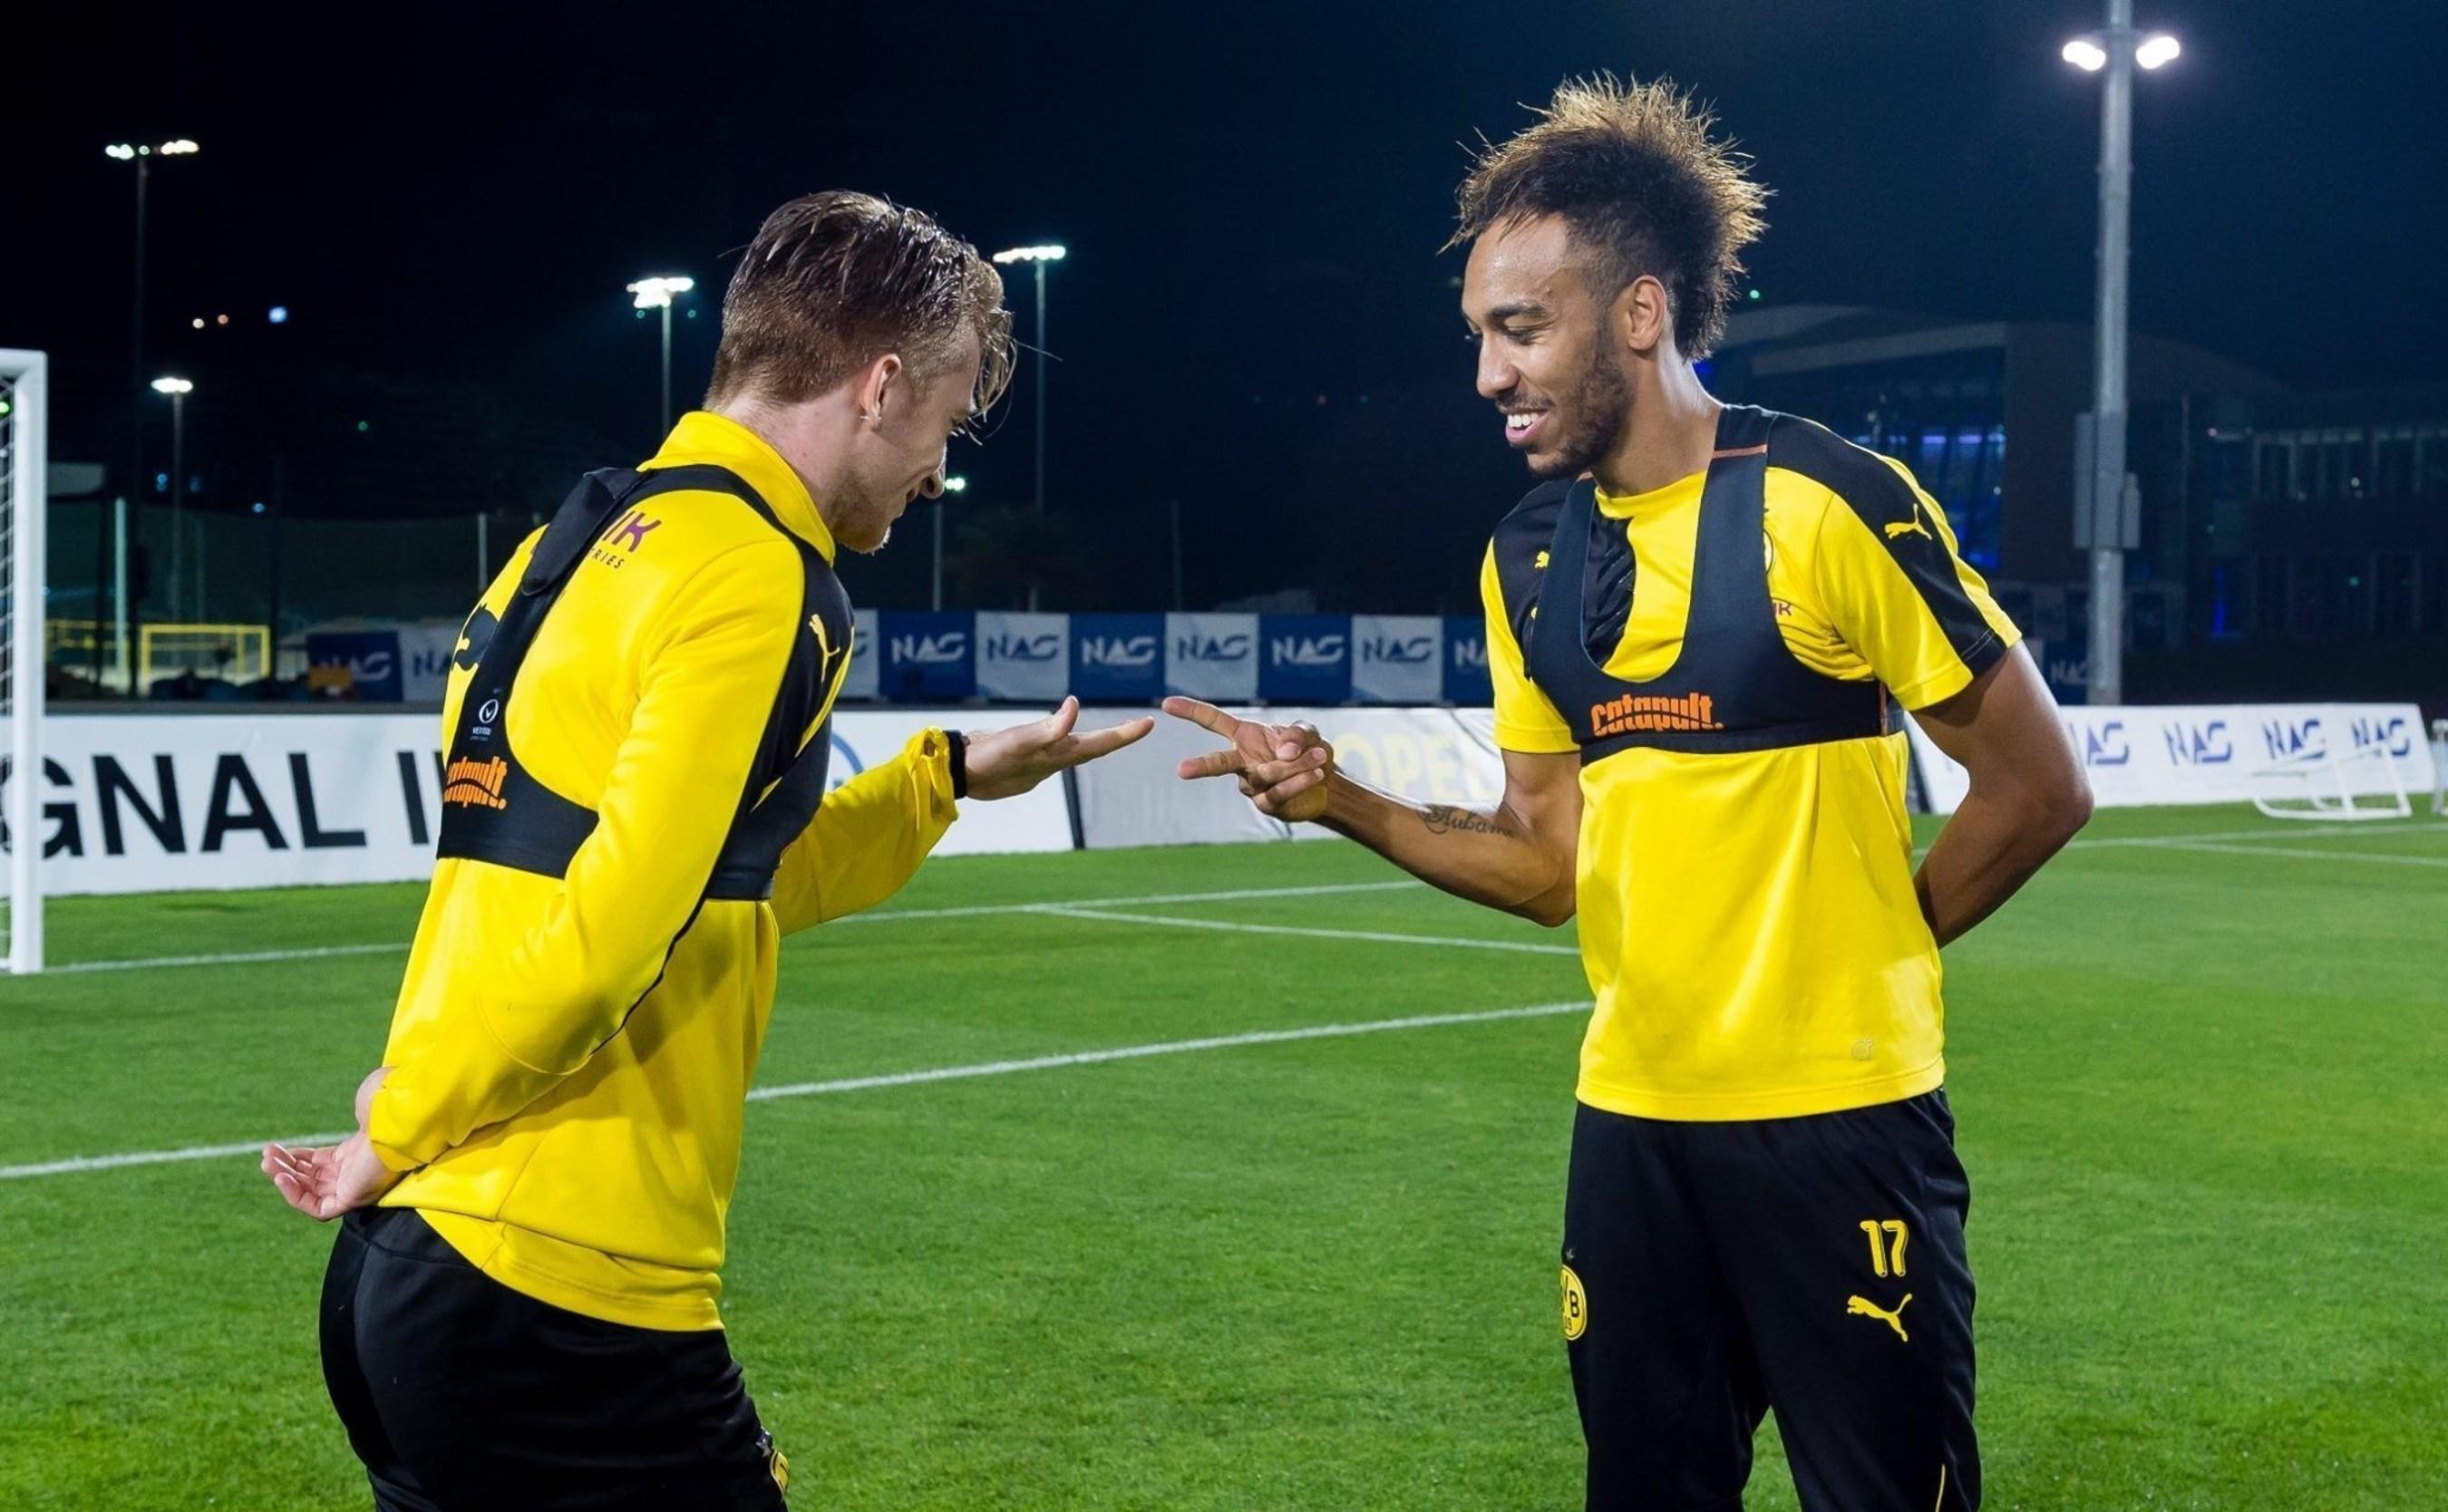 'Who will be taking Dortmund's #18toWin penalty? Marco Reus or Pierre-Emerick Aubameyang?' (PRNewsFoto/FOX Sports) (PRNewsFoto/FOX Sports)